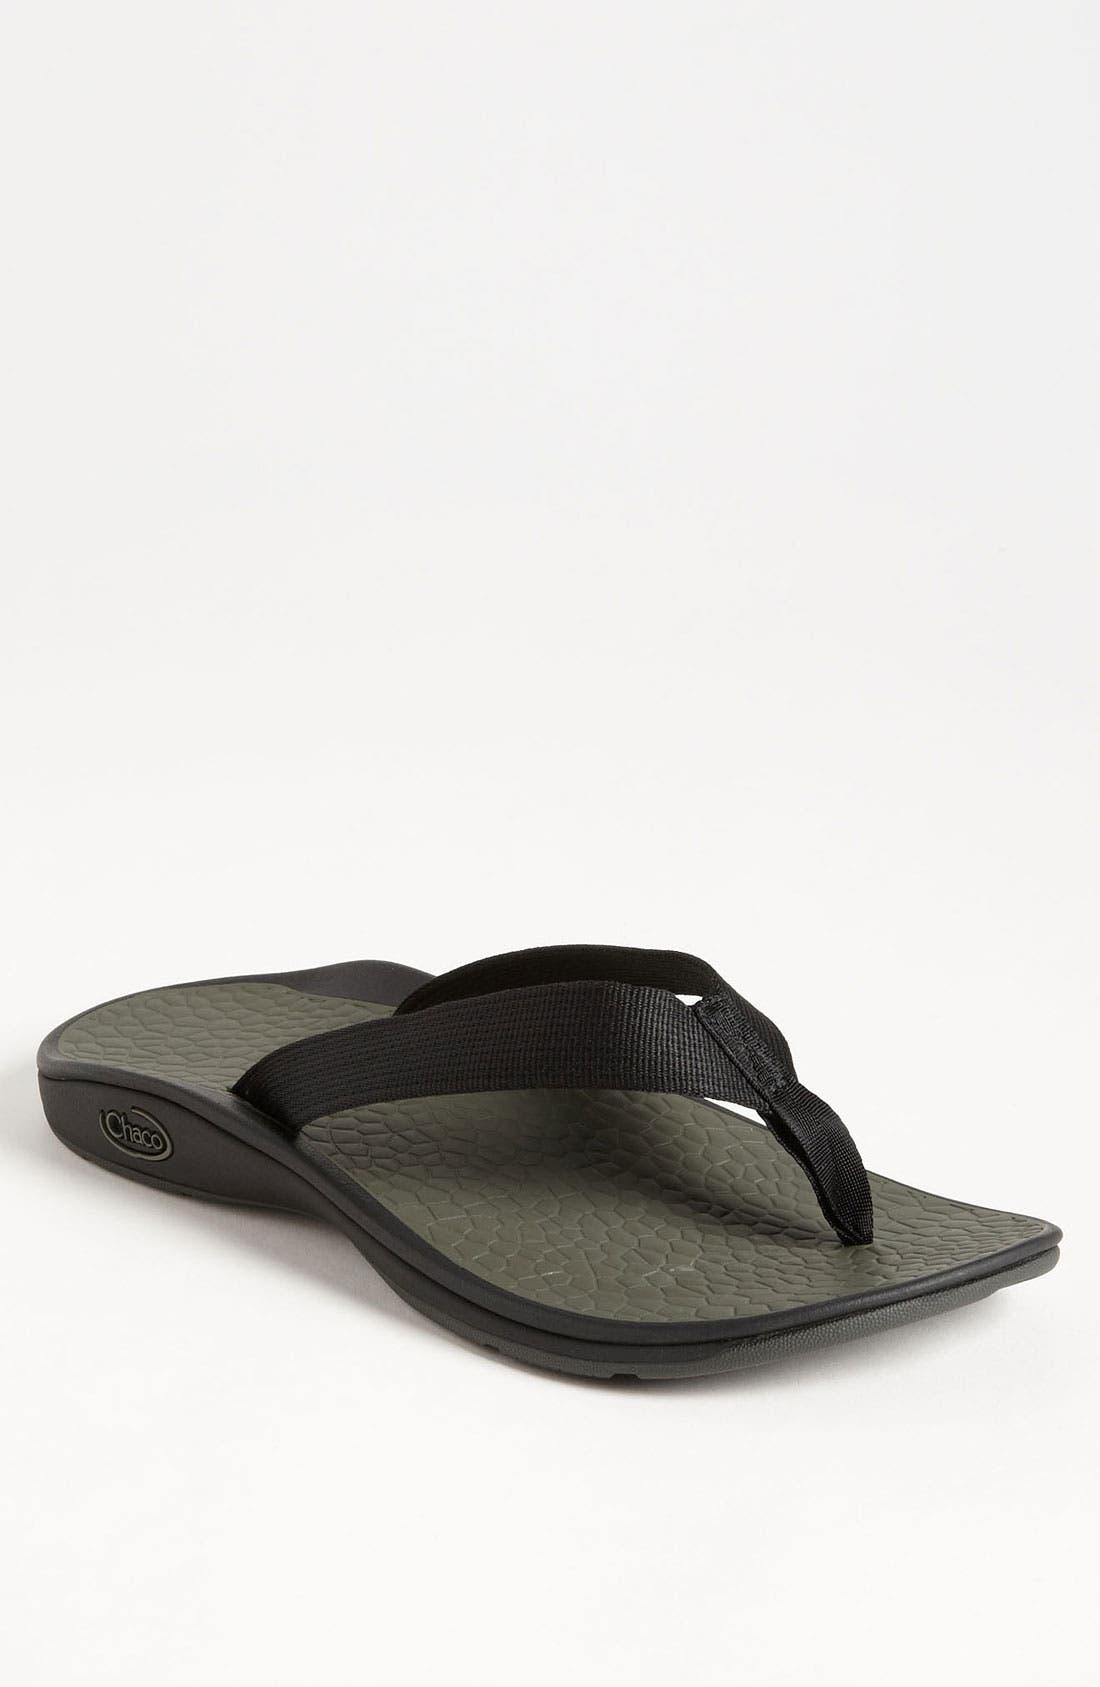 Alternate Image 1 Selected - Chaco 'Fathom' Flip Flop (Men)